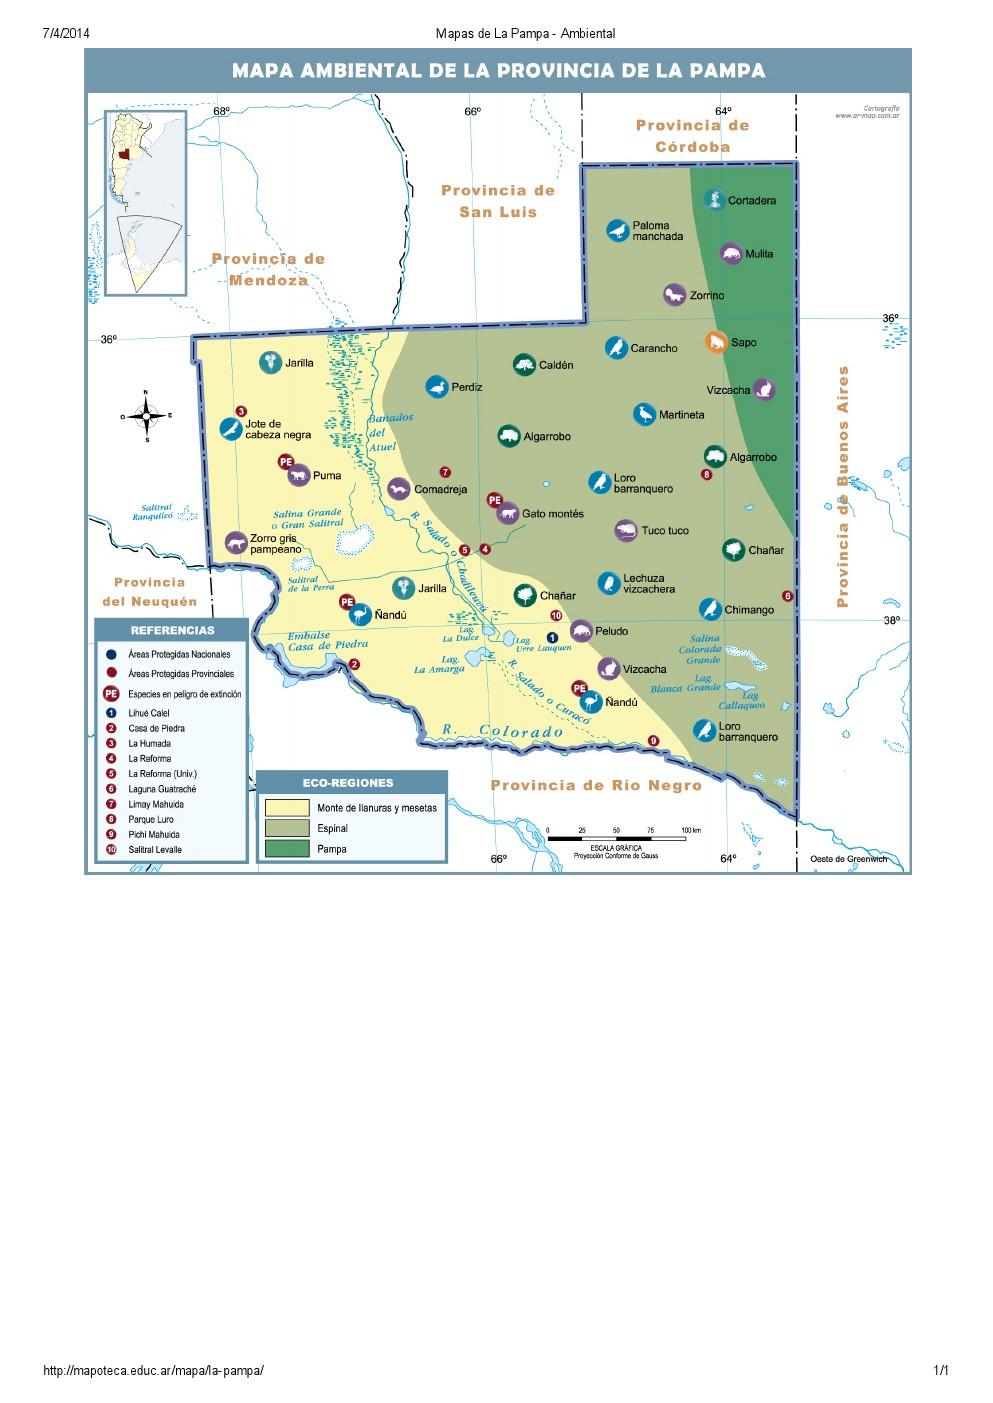 Mapa ambiental de La Pampa. Mapoteca de Educ.ar